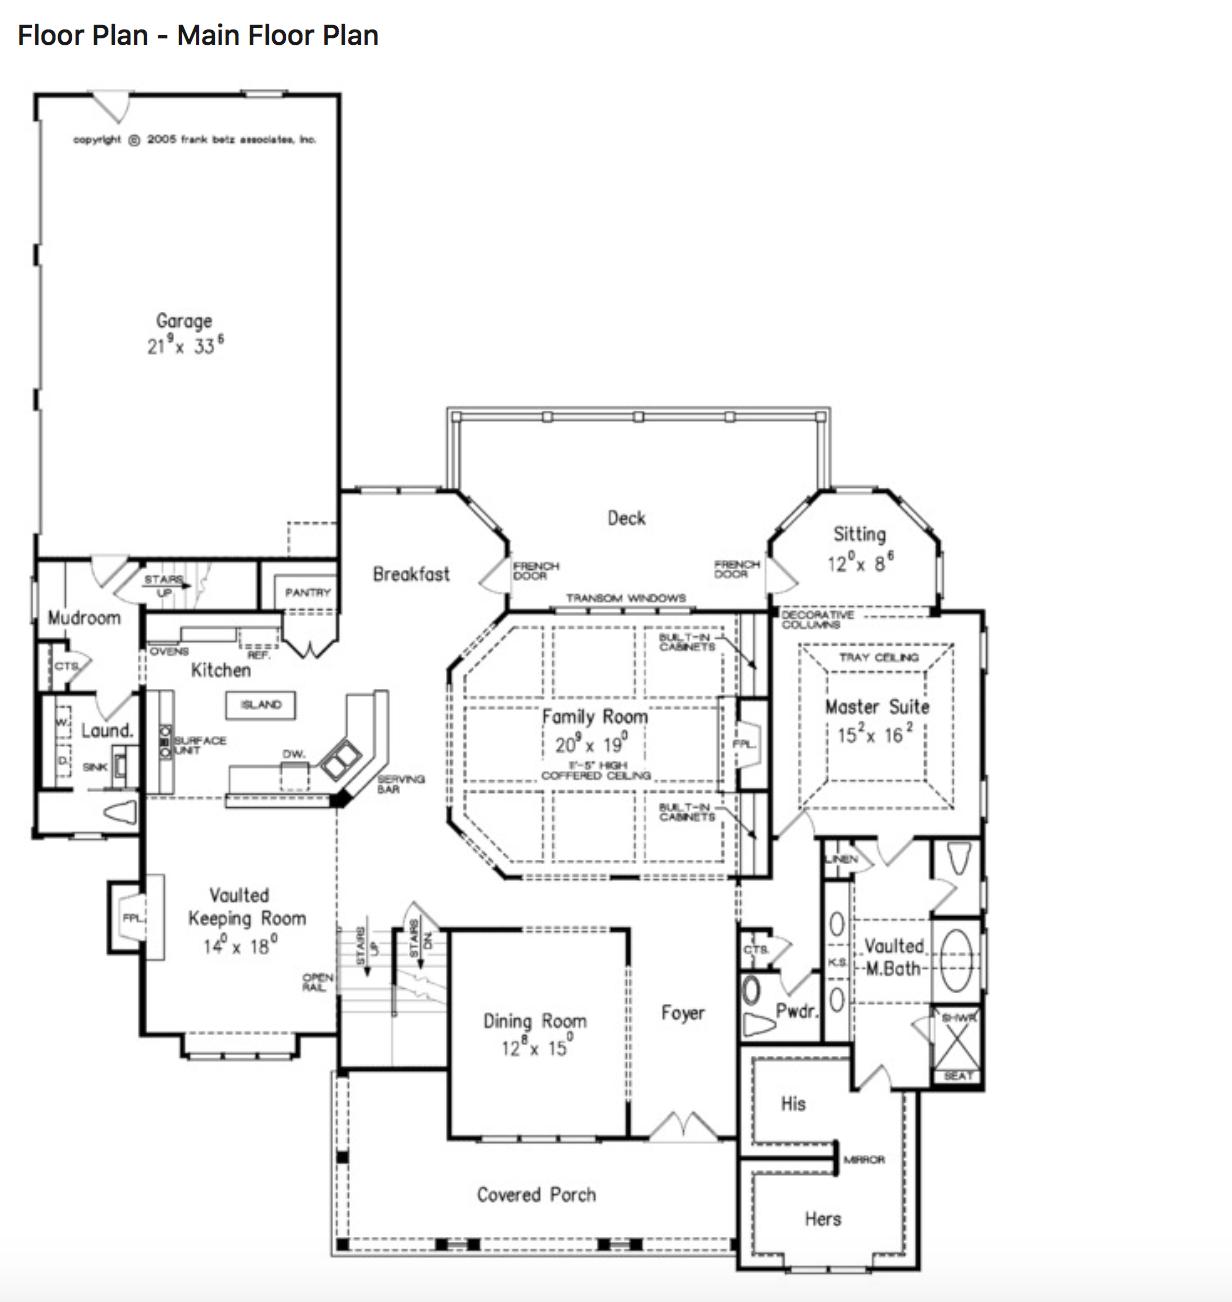 craftsman-main-floor-plan-1.png